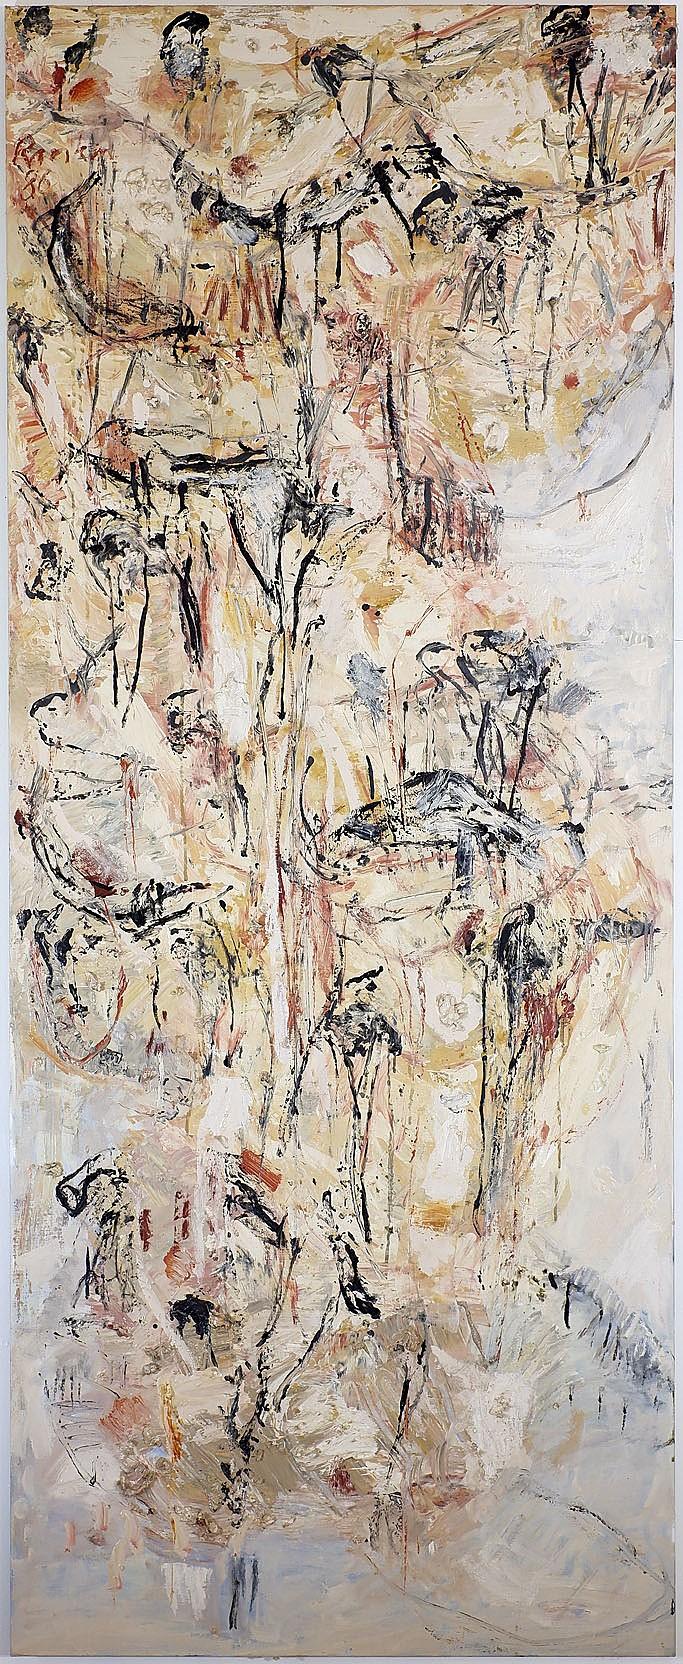 'David Rankin (b. 1946), Headland - Sandstone Coast, Oil on Canvas'